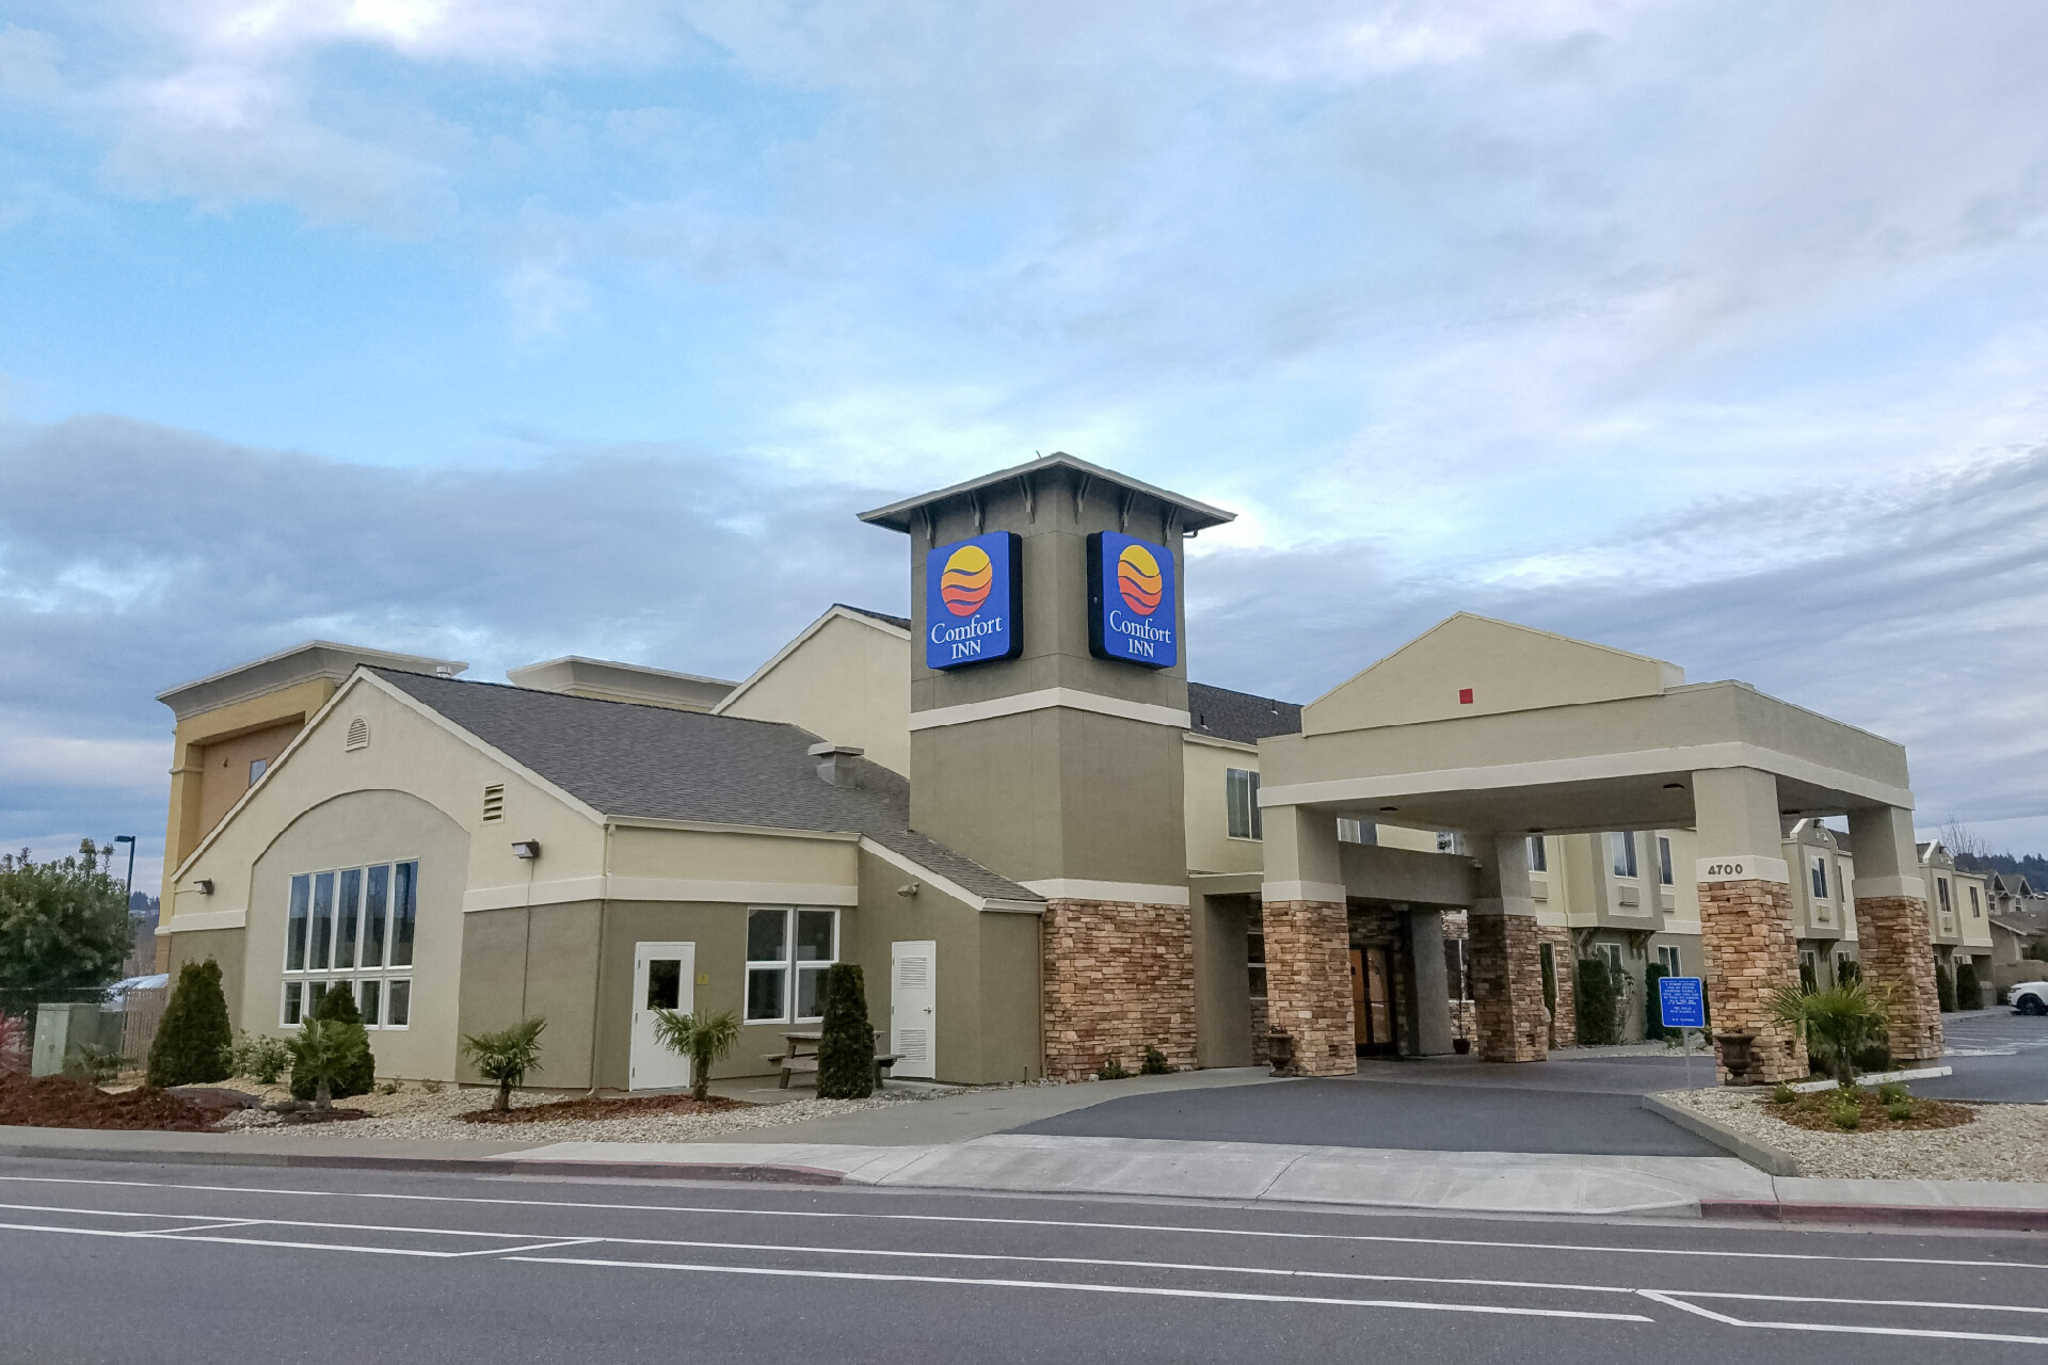 Comfort Inn Arcata - Humboldt Area, Arcata CA